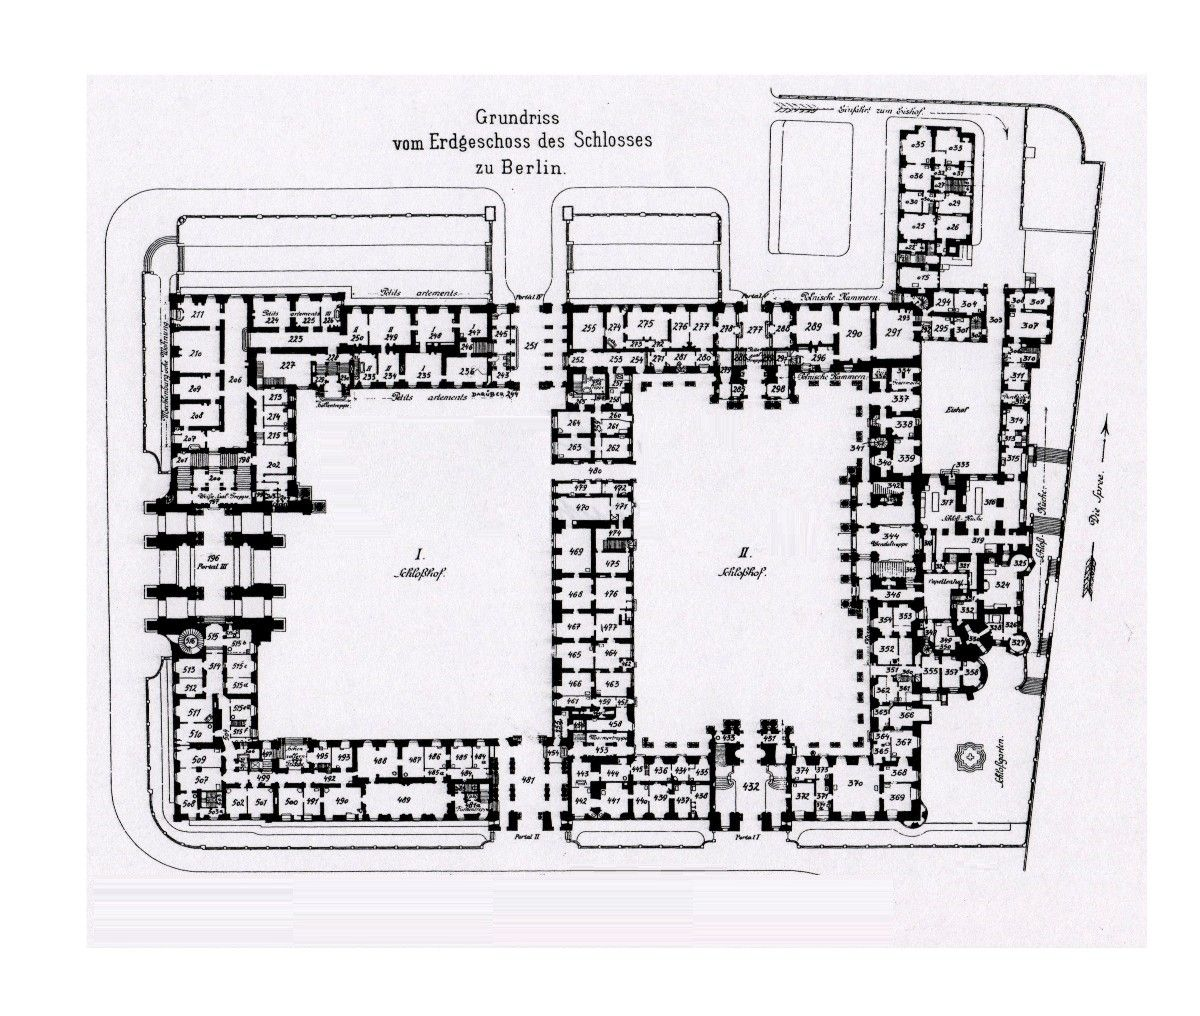 royal palace berlin 1933 ground floor plan architectural ground floor plan